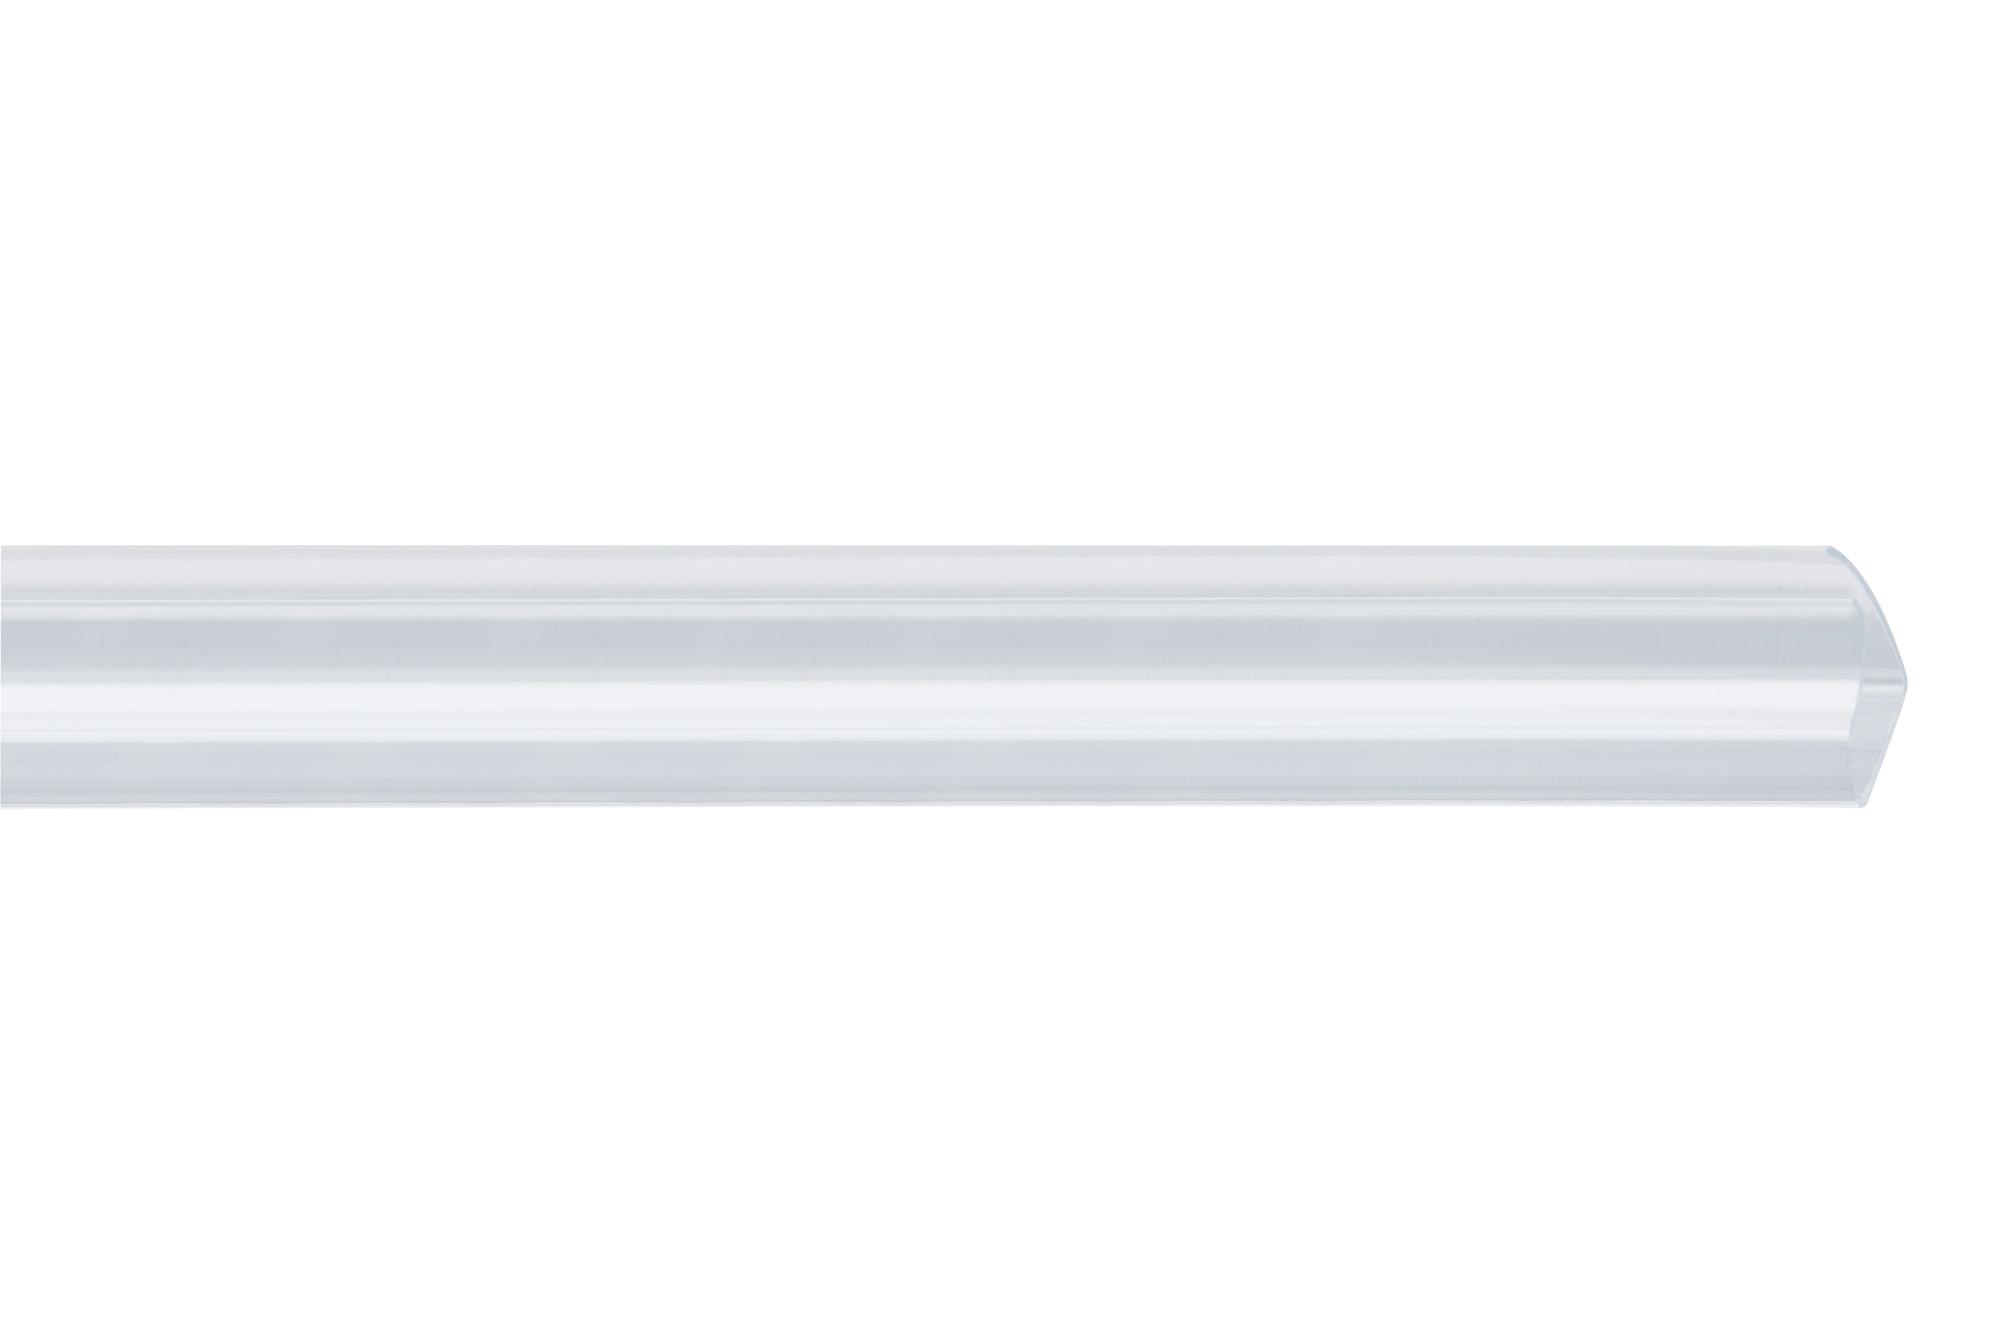 Paulmann. 70283 Пластиковый держатель FN BackLight Profil 100cm Transparent